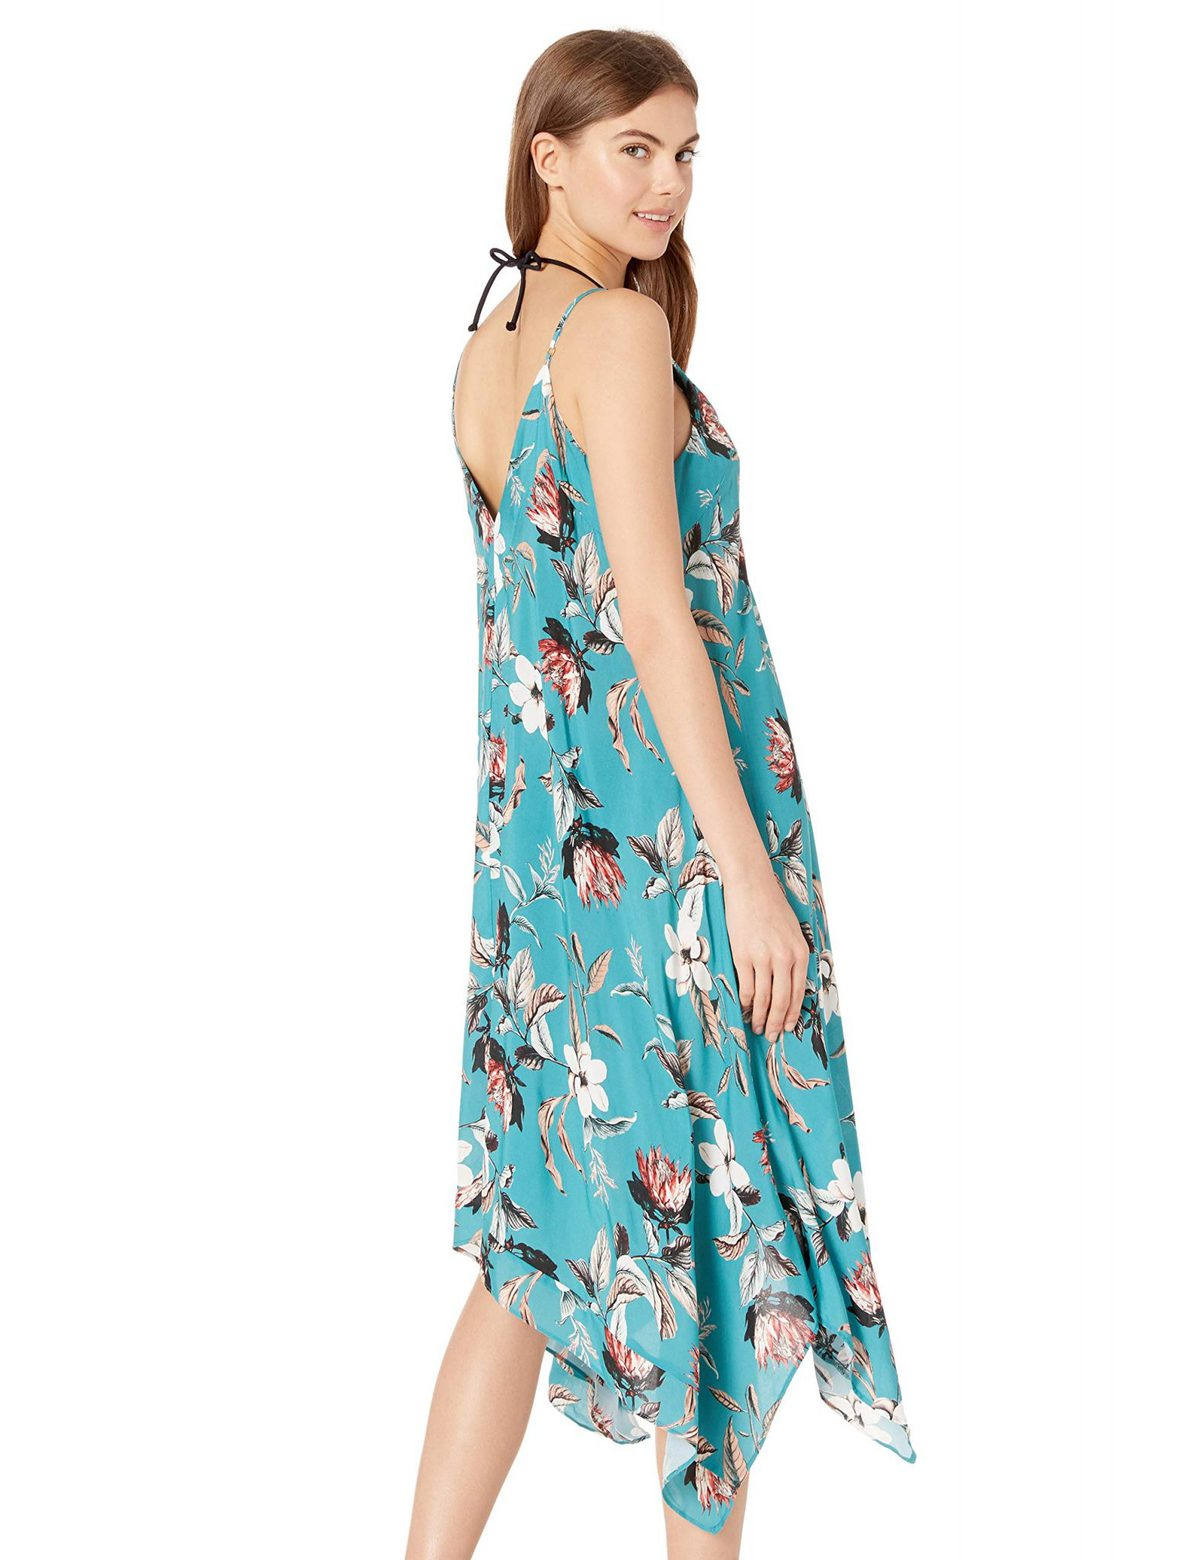 Ladies Dress Cotton Dress Beach Dress Sea dress,Fish Dress Short Sleeved Dress Festival Clothing Women Dress Turquoise Dress